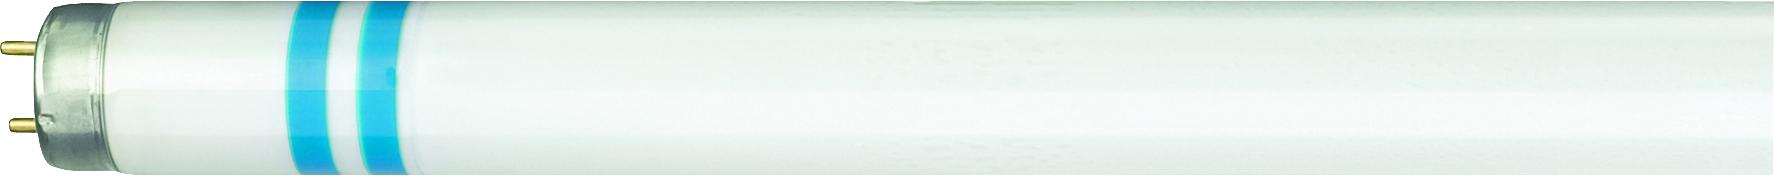 1 Stk TL-D Secura 18W/840 G13 Leuchtstoffröhre Neutralweiß LI82610940